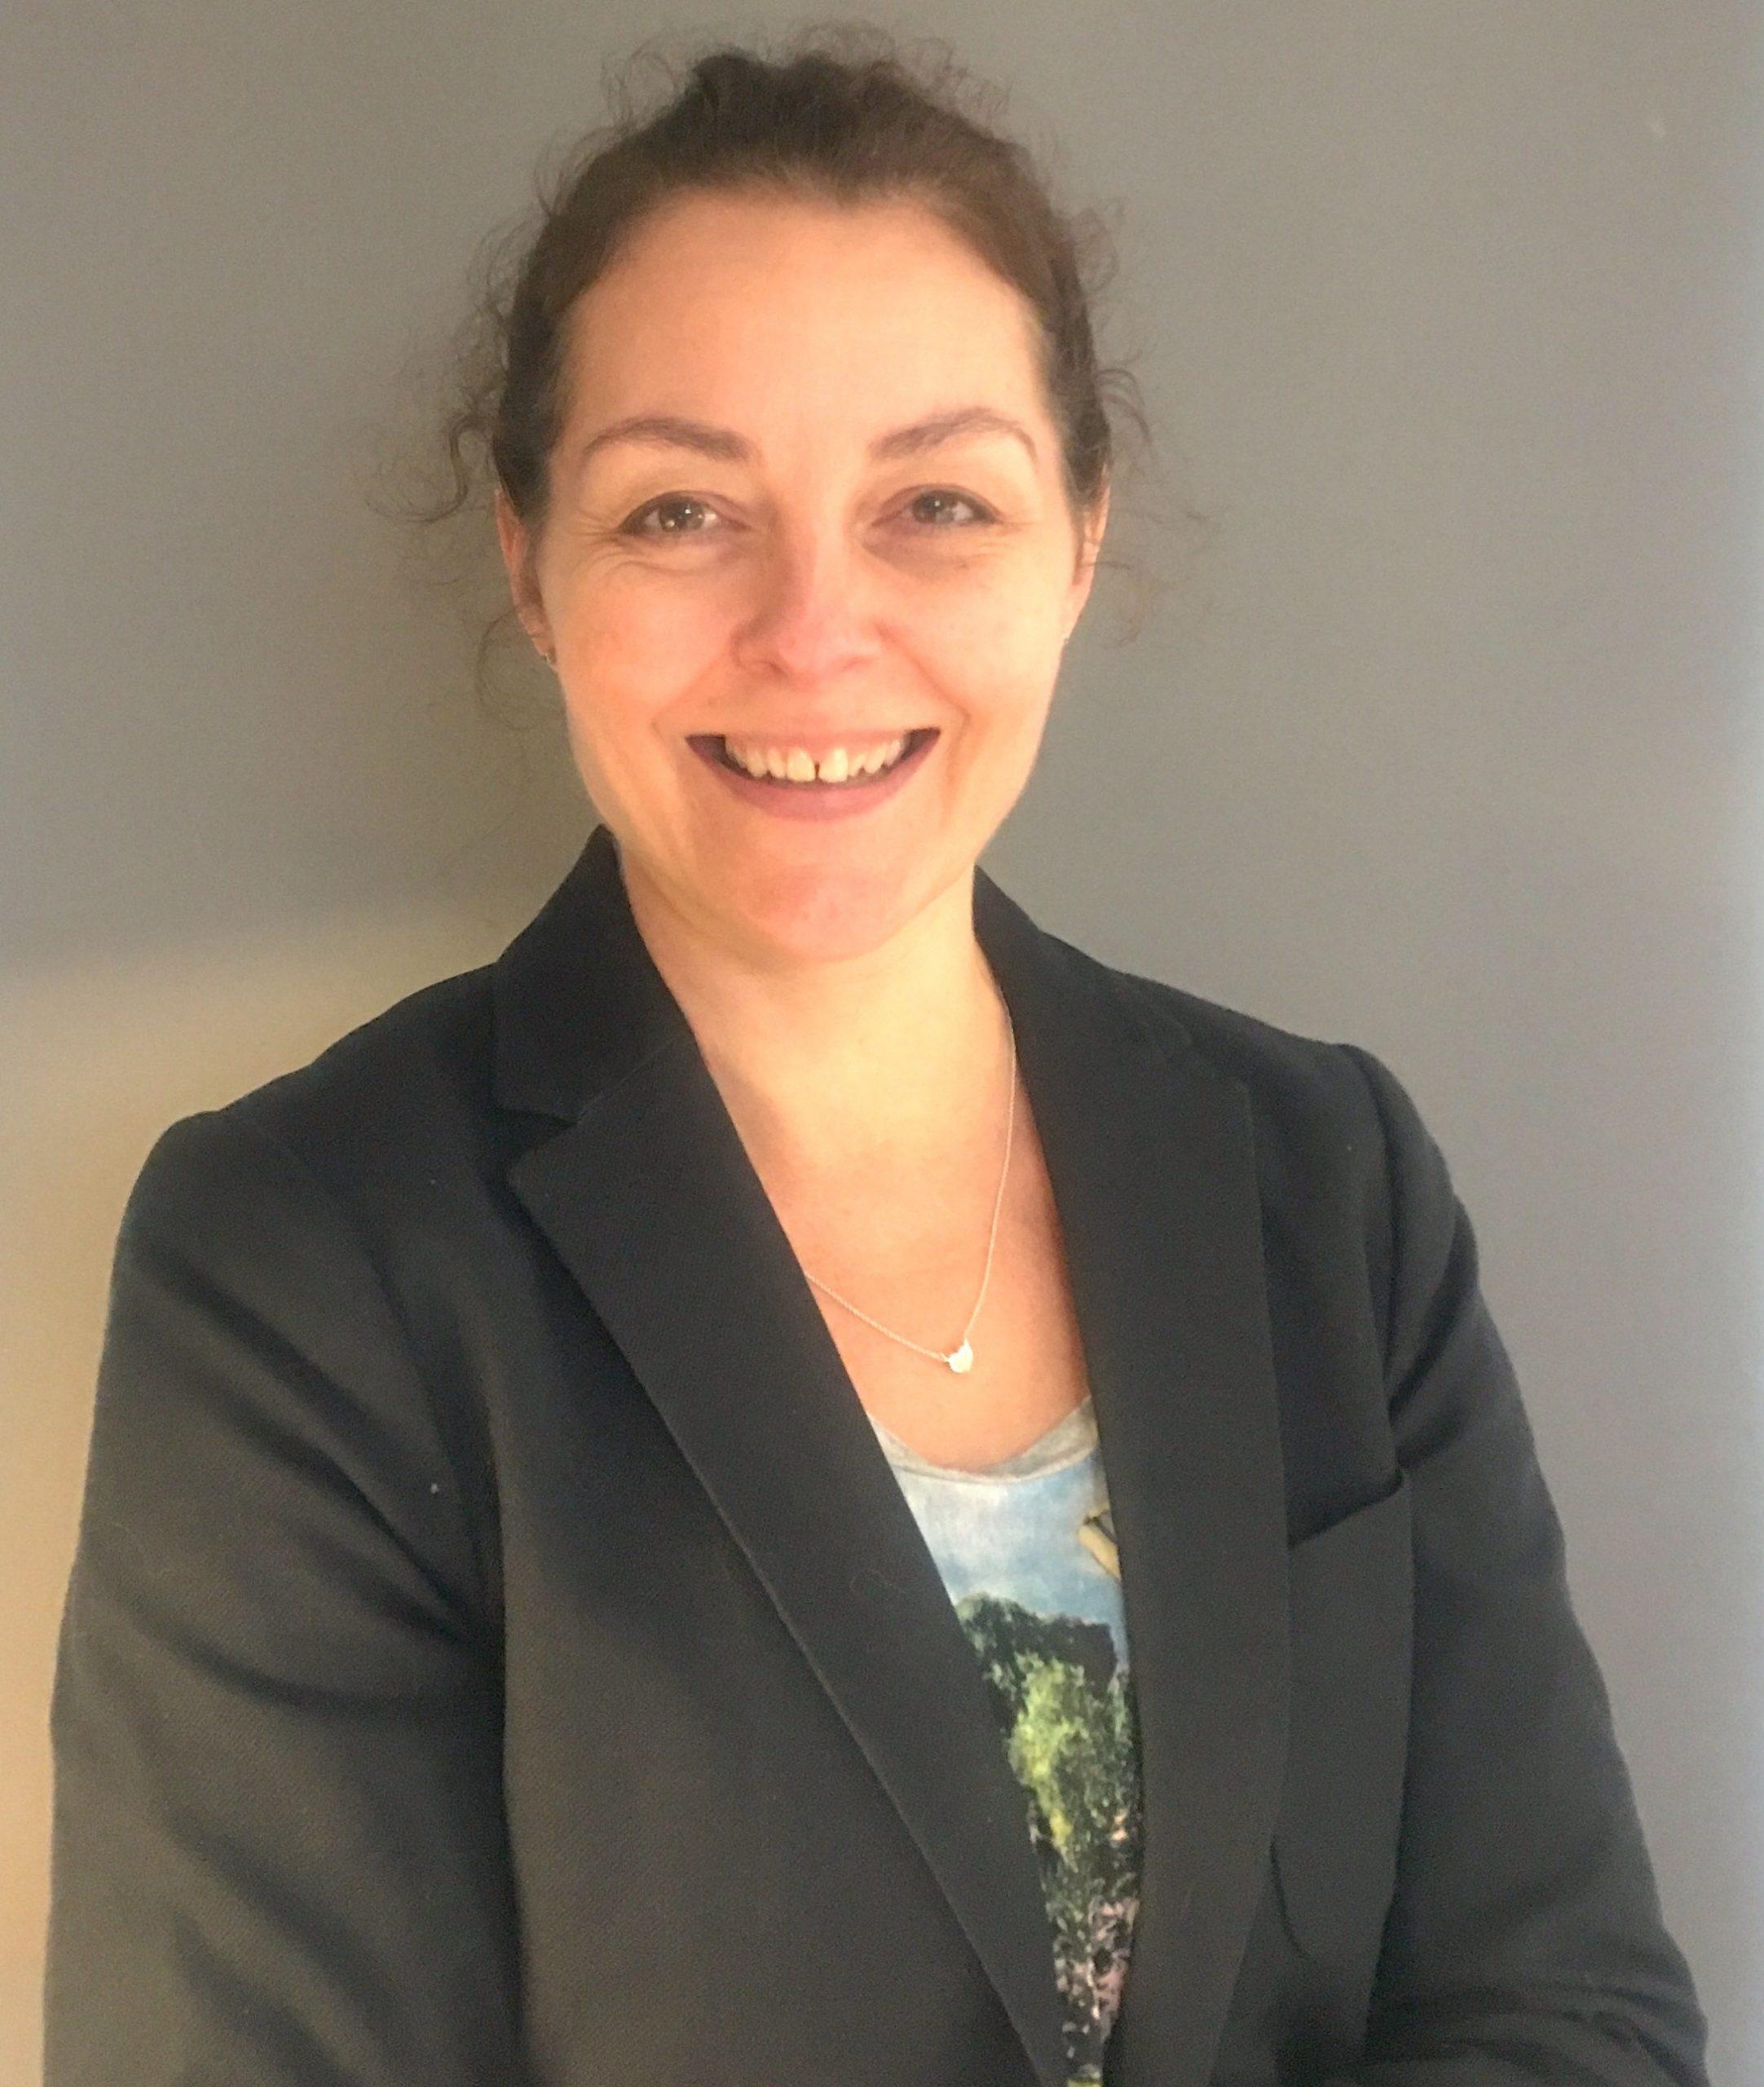 Joanna Fergusson